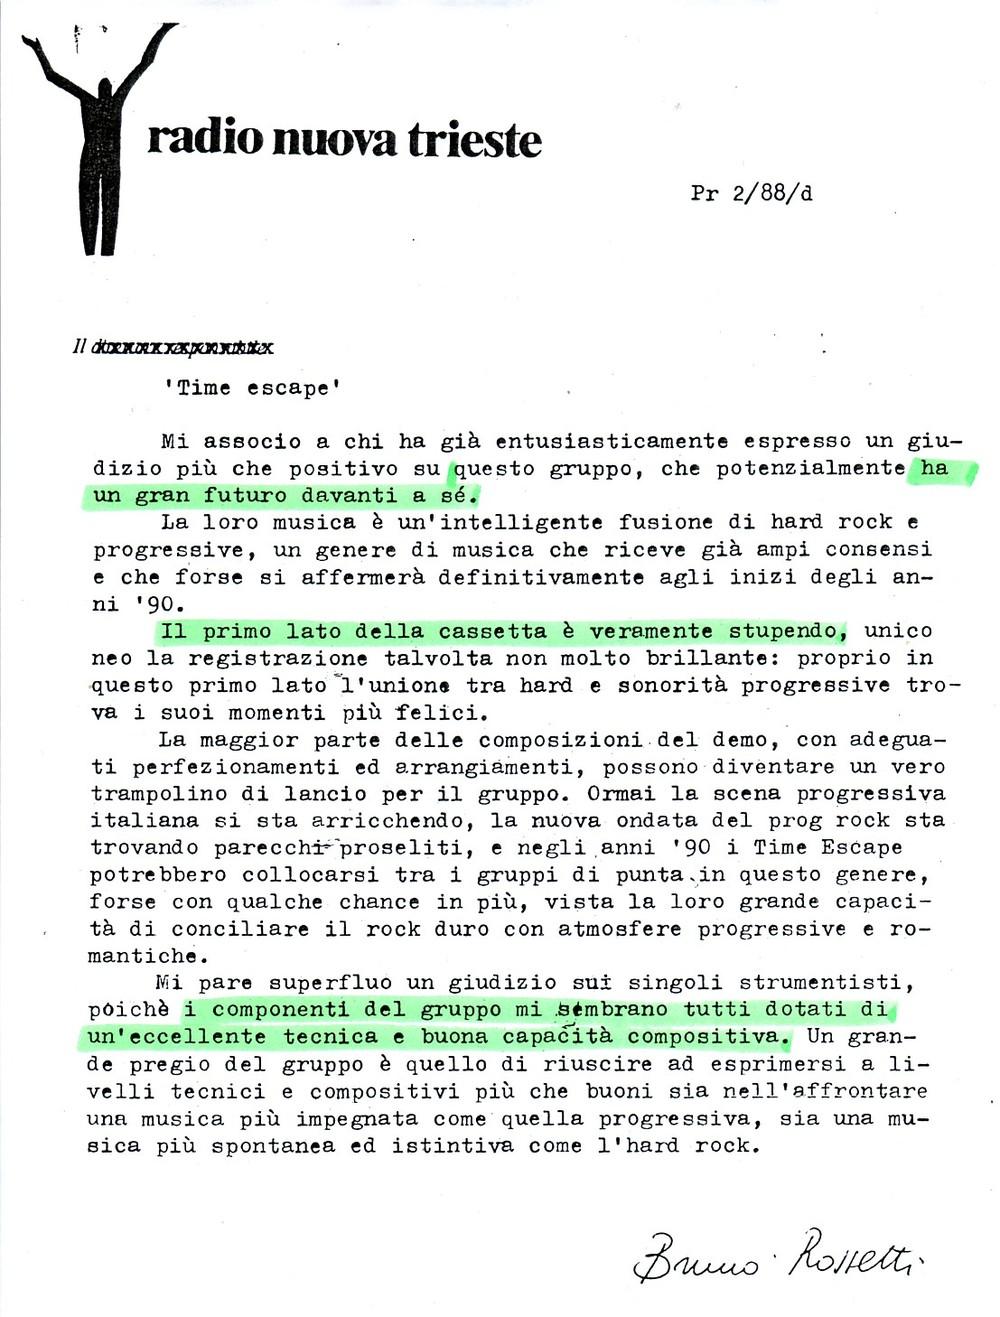 RADIO NUOVA TRIESTE (ITALY) - 1988